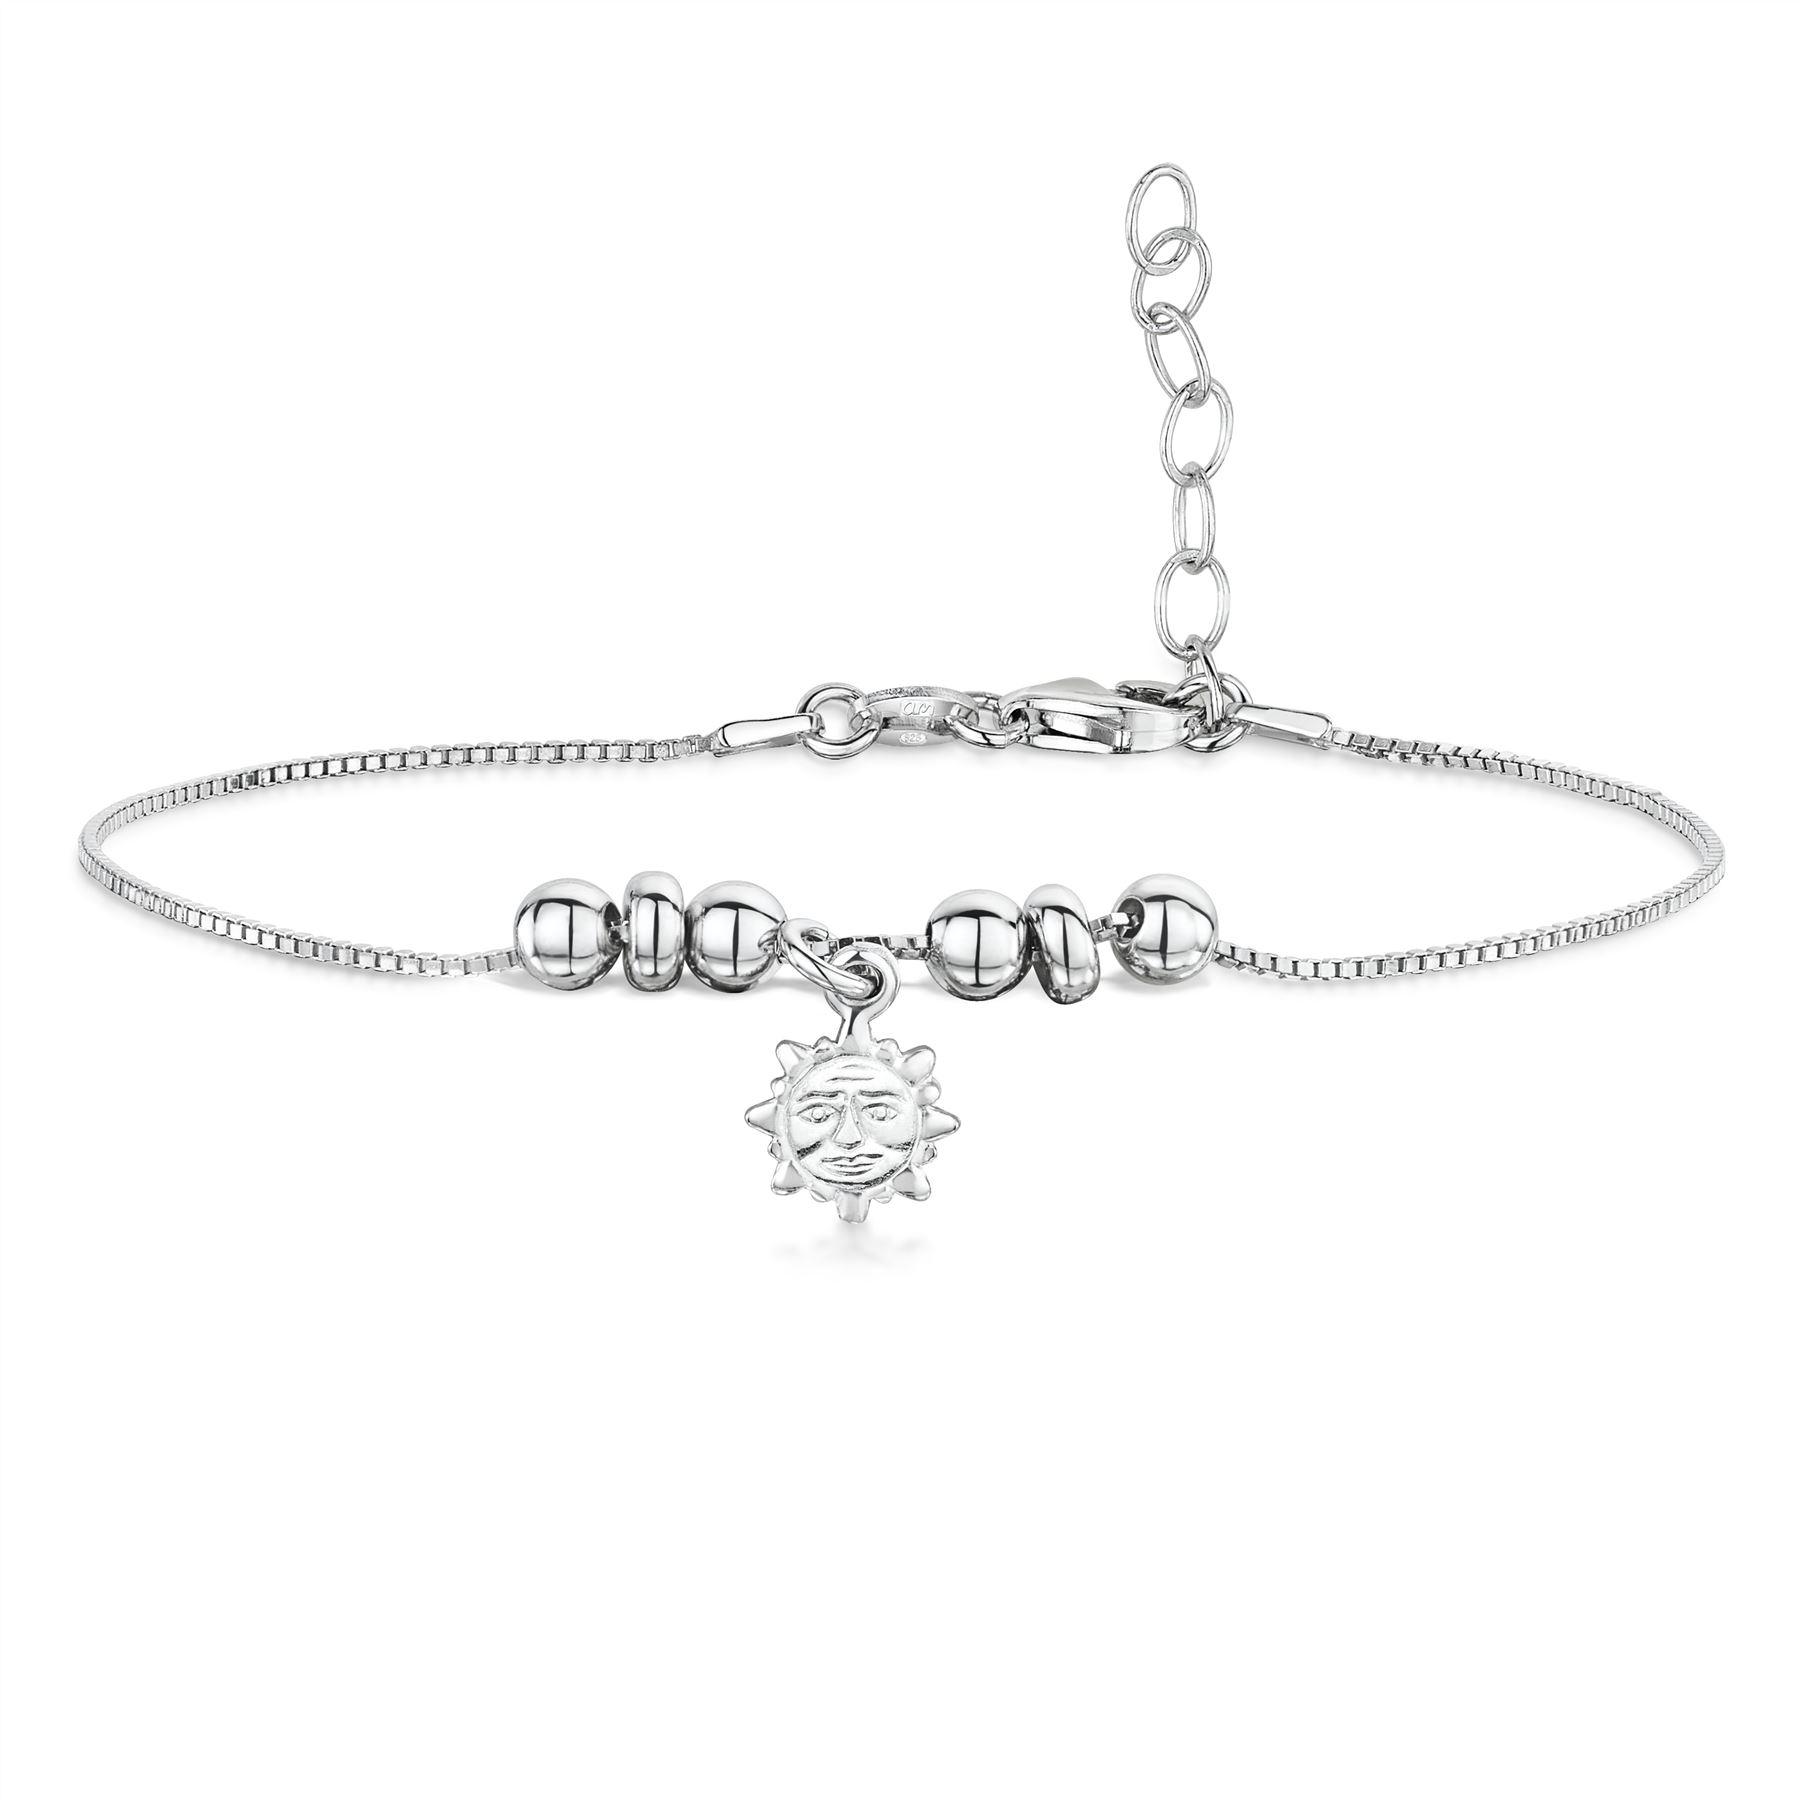 Amberta-Jewelry-925-Sterling-Silver-Adjustable-Bracelet-Italian-Bangle-for-Women thumbnail 9